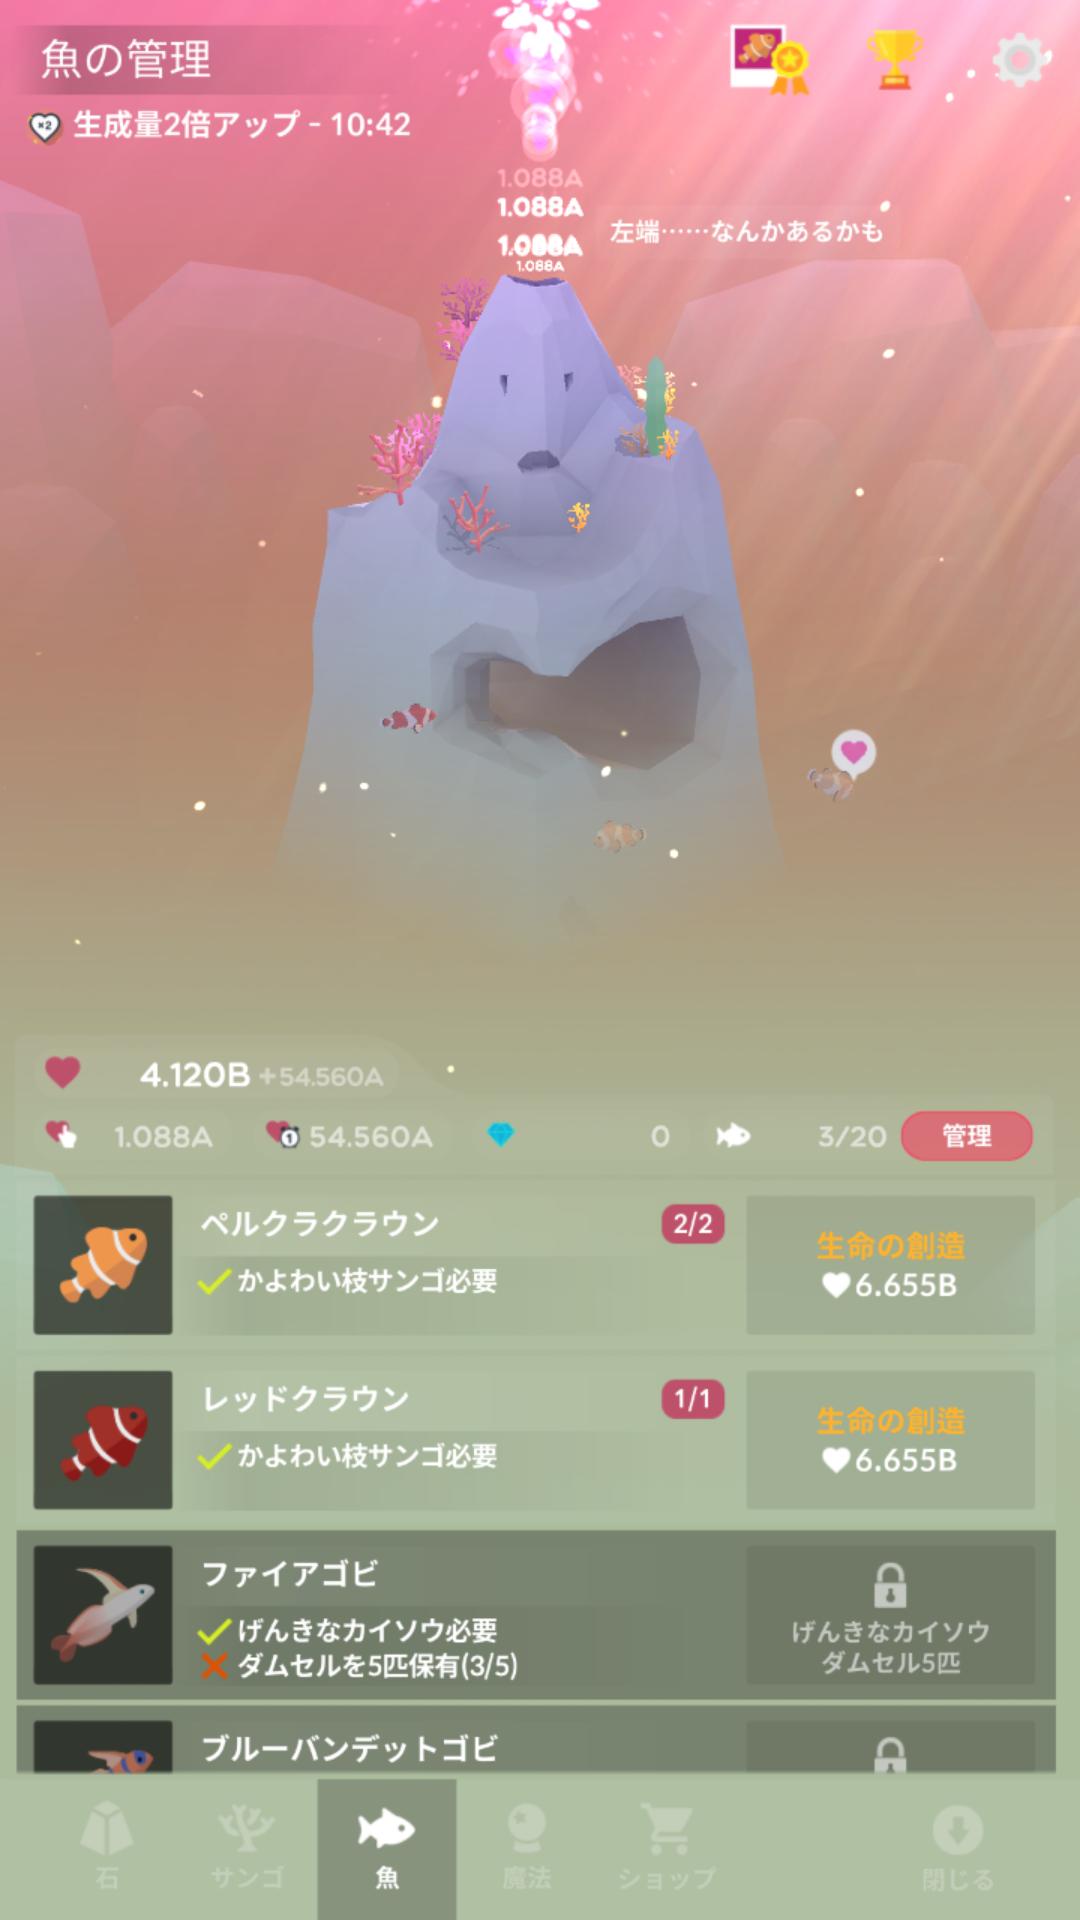 androidアプリ アビスリウム(Abyssrium)攻略スクリーンショット2